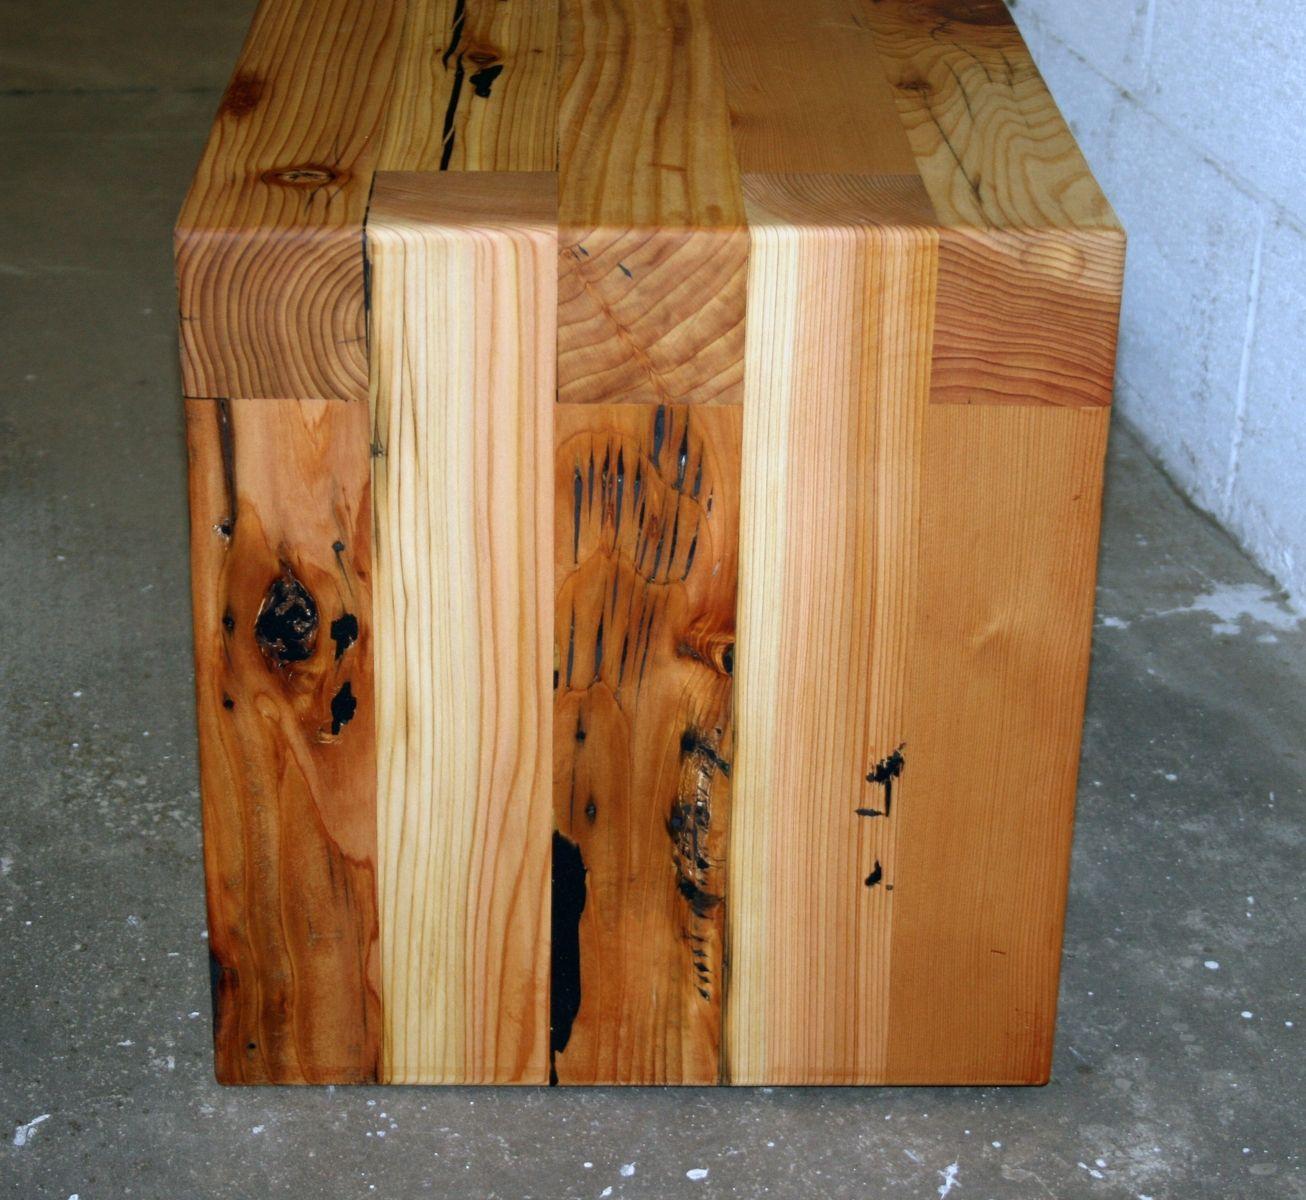 Hand made reclaimed cedar box joint bench coffee table by - Hand Made Reclaimed Cedar Box Joint Bench Coffee Table By Historicwoods By Lunarcanyon Custommade Com